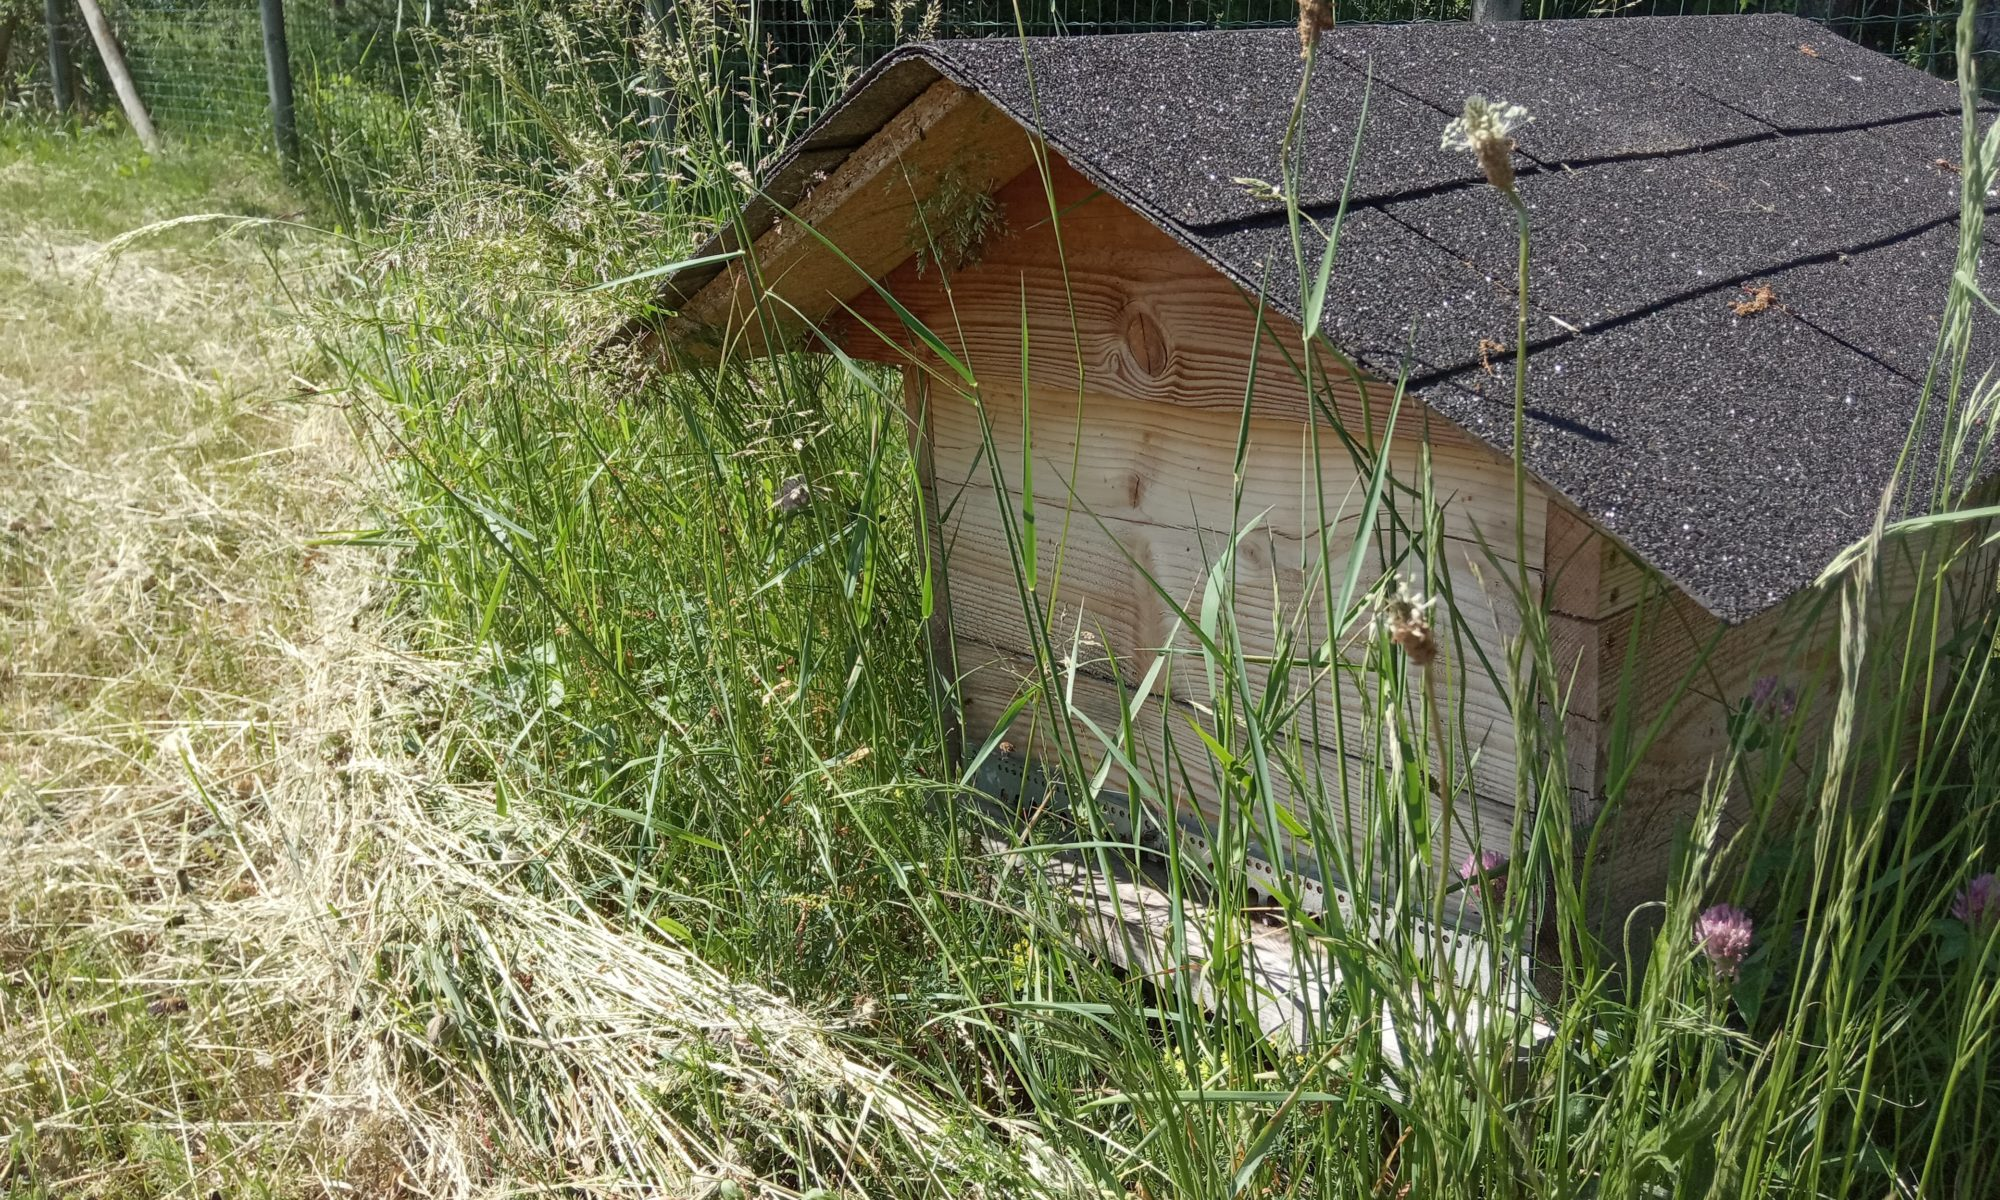 Mettre une ruche dans son jardin